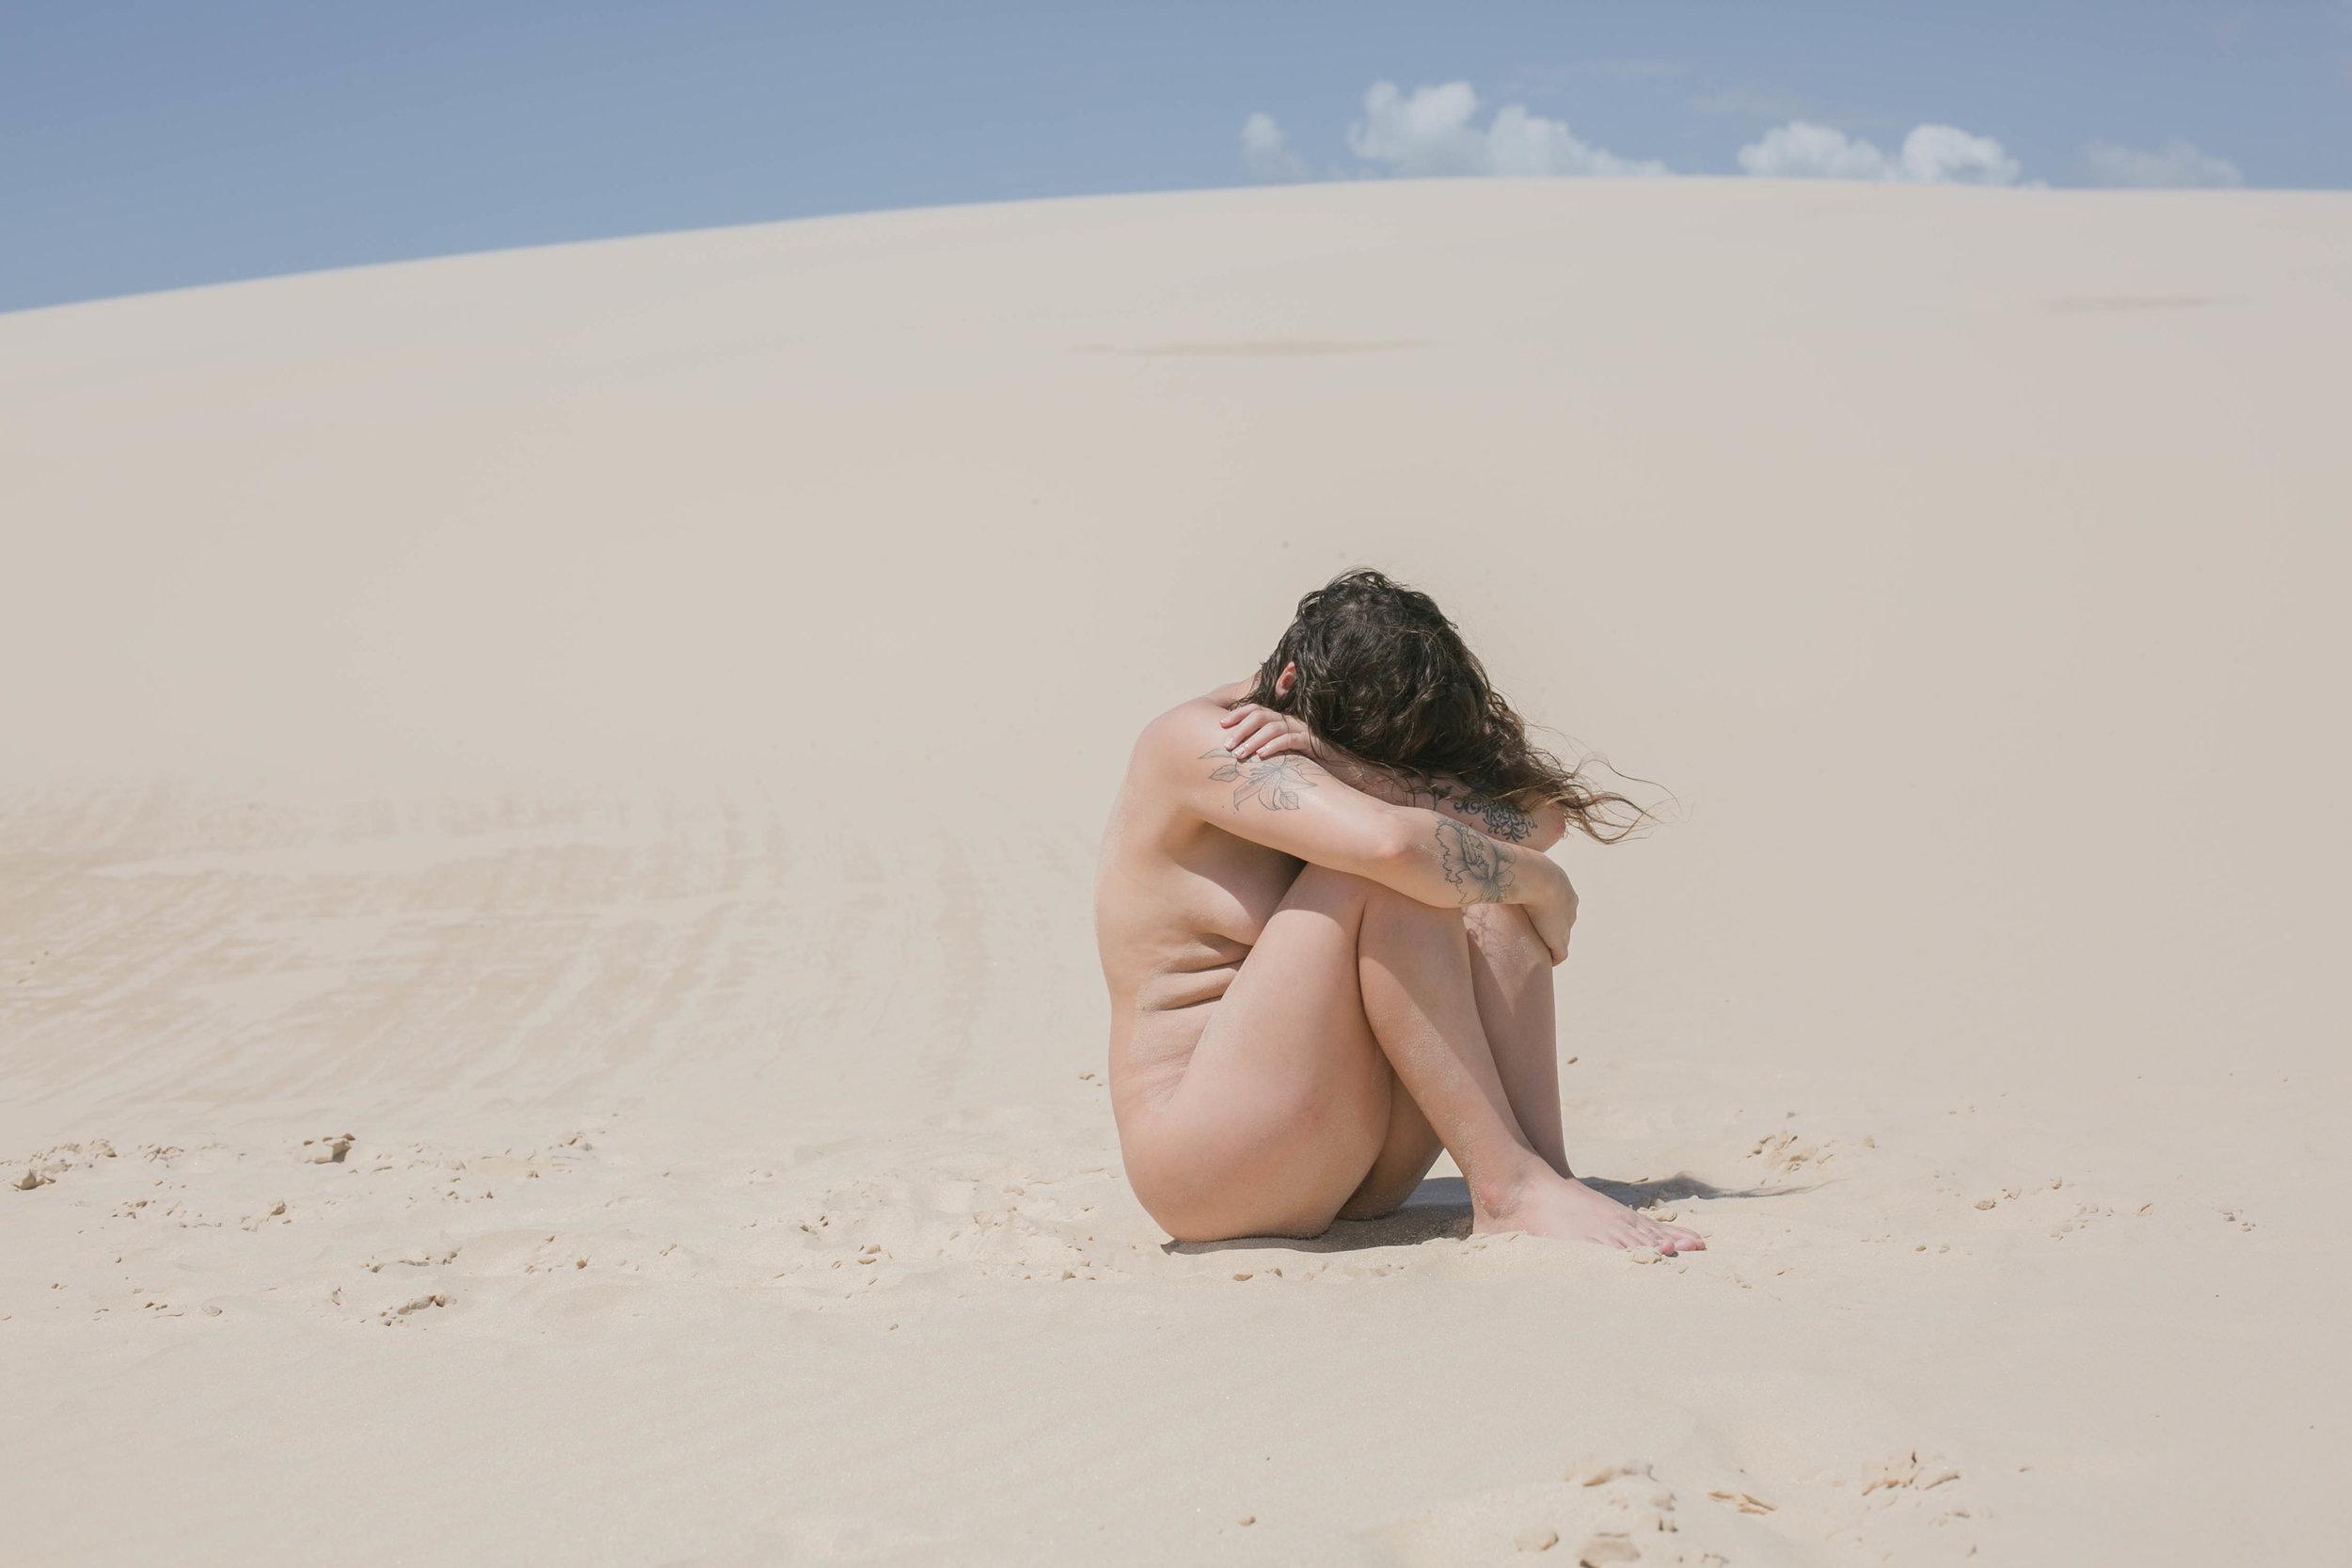 Olhar de Beatriz Xavier, artista convidada para nossa jornada sobre finitude